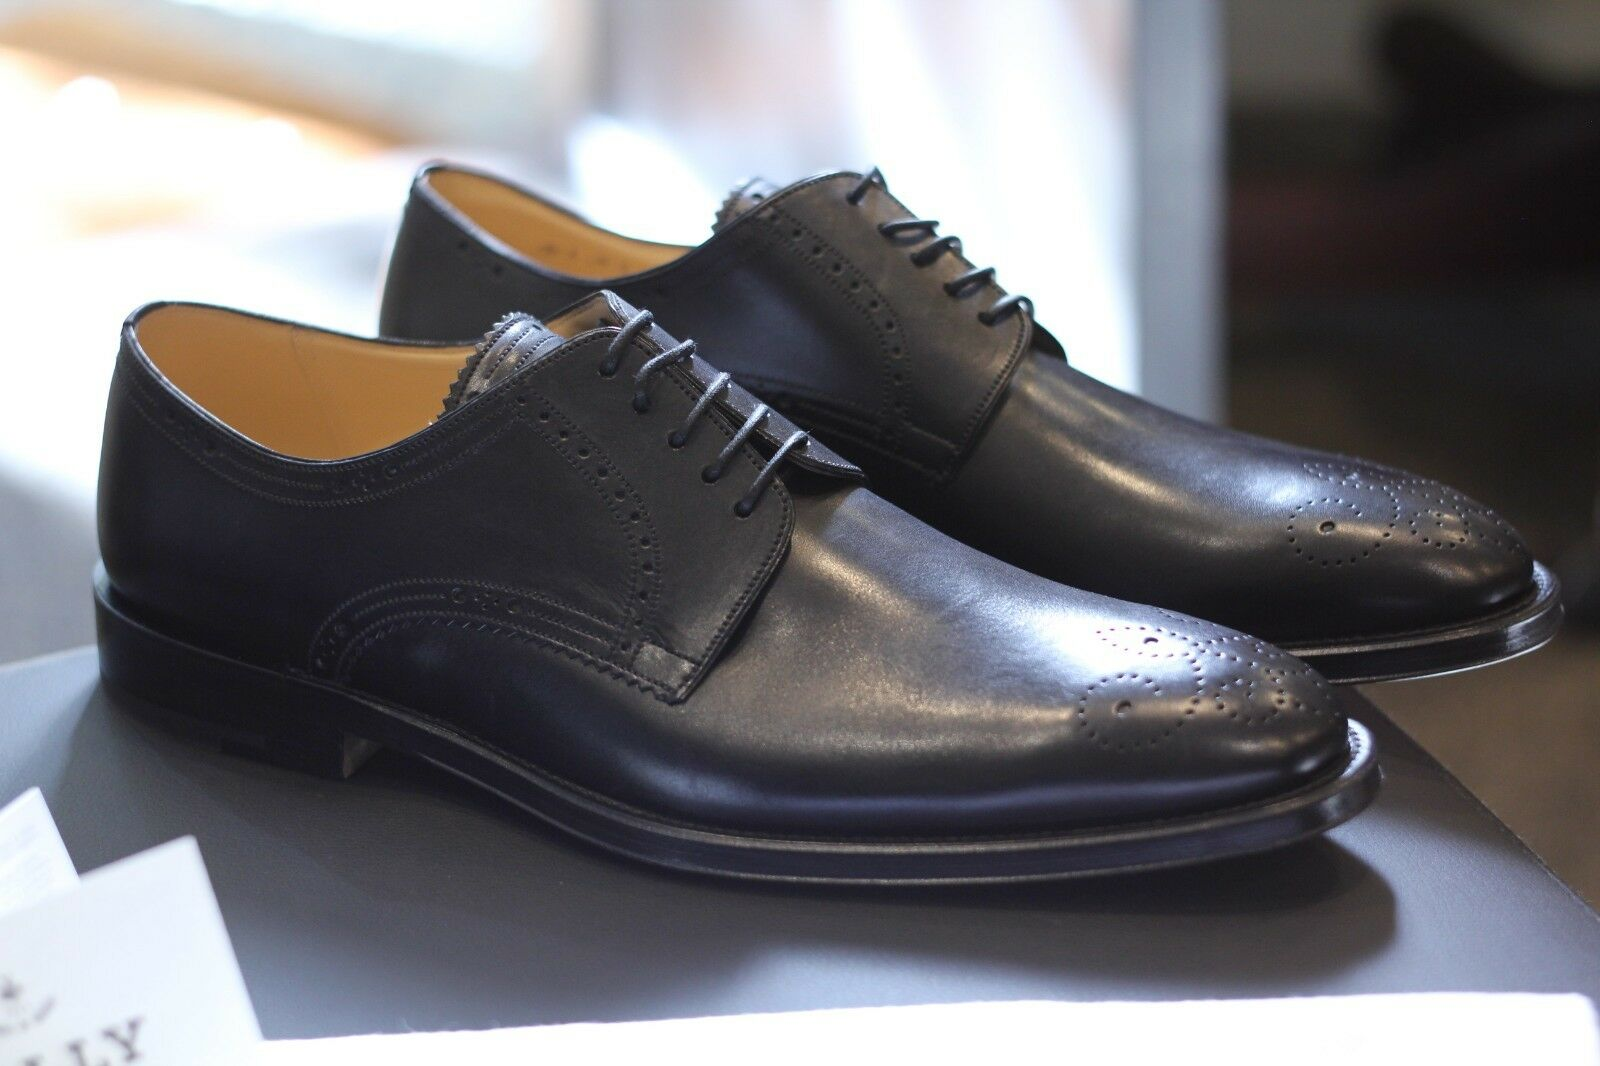 Bally Tatoon Derby De Becerro Negro Zapatos Raro Descatalogado Swiss Nuevo Tamaño 11.5 D